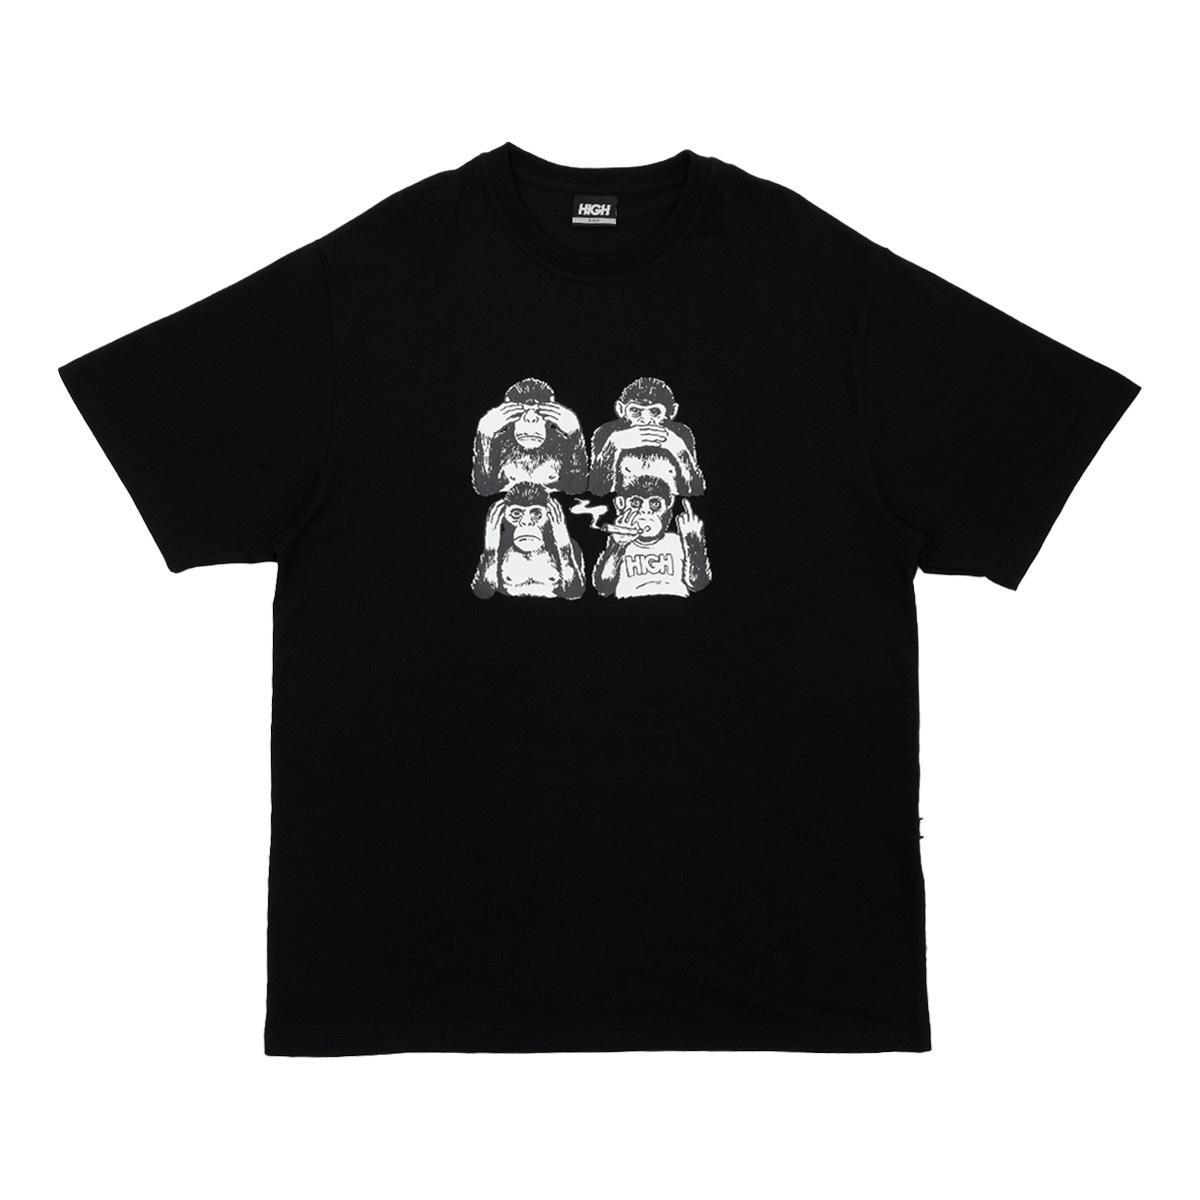 Tee Monkeys Black High